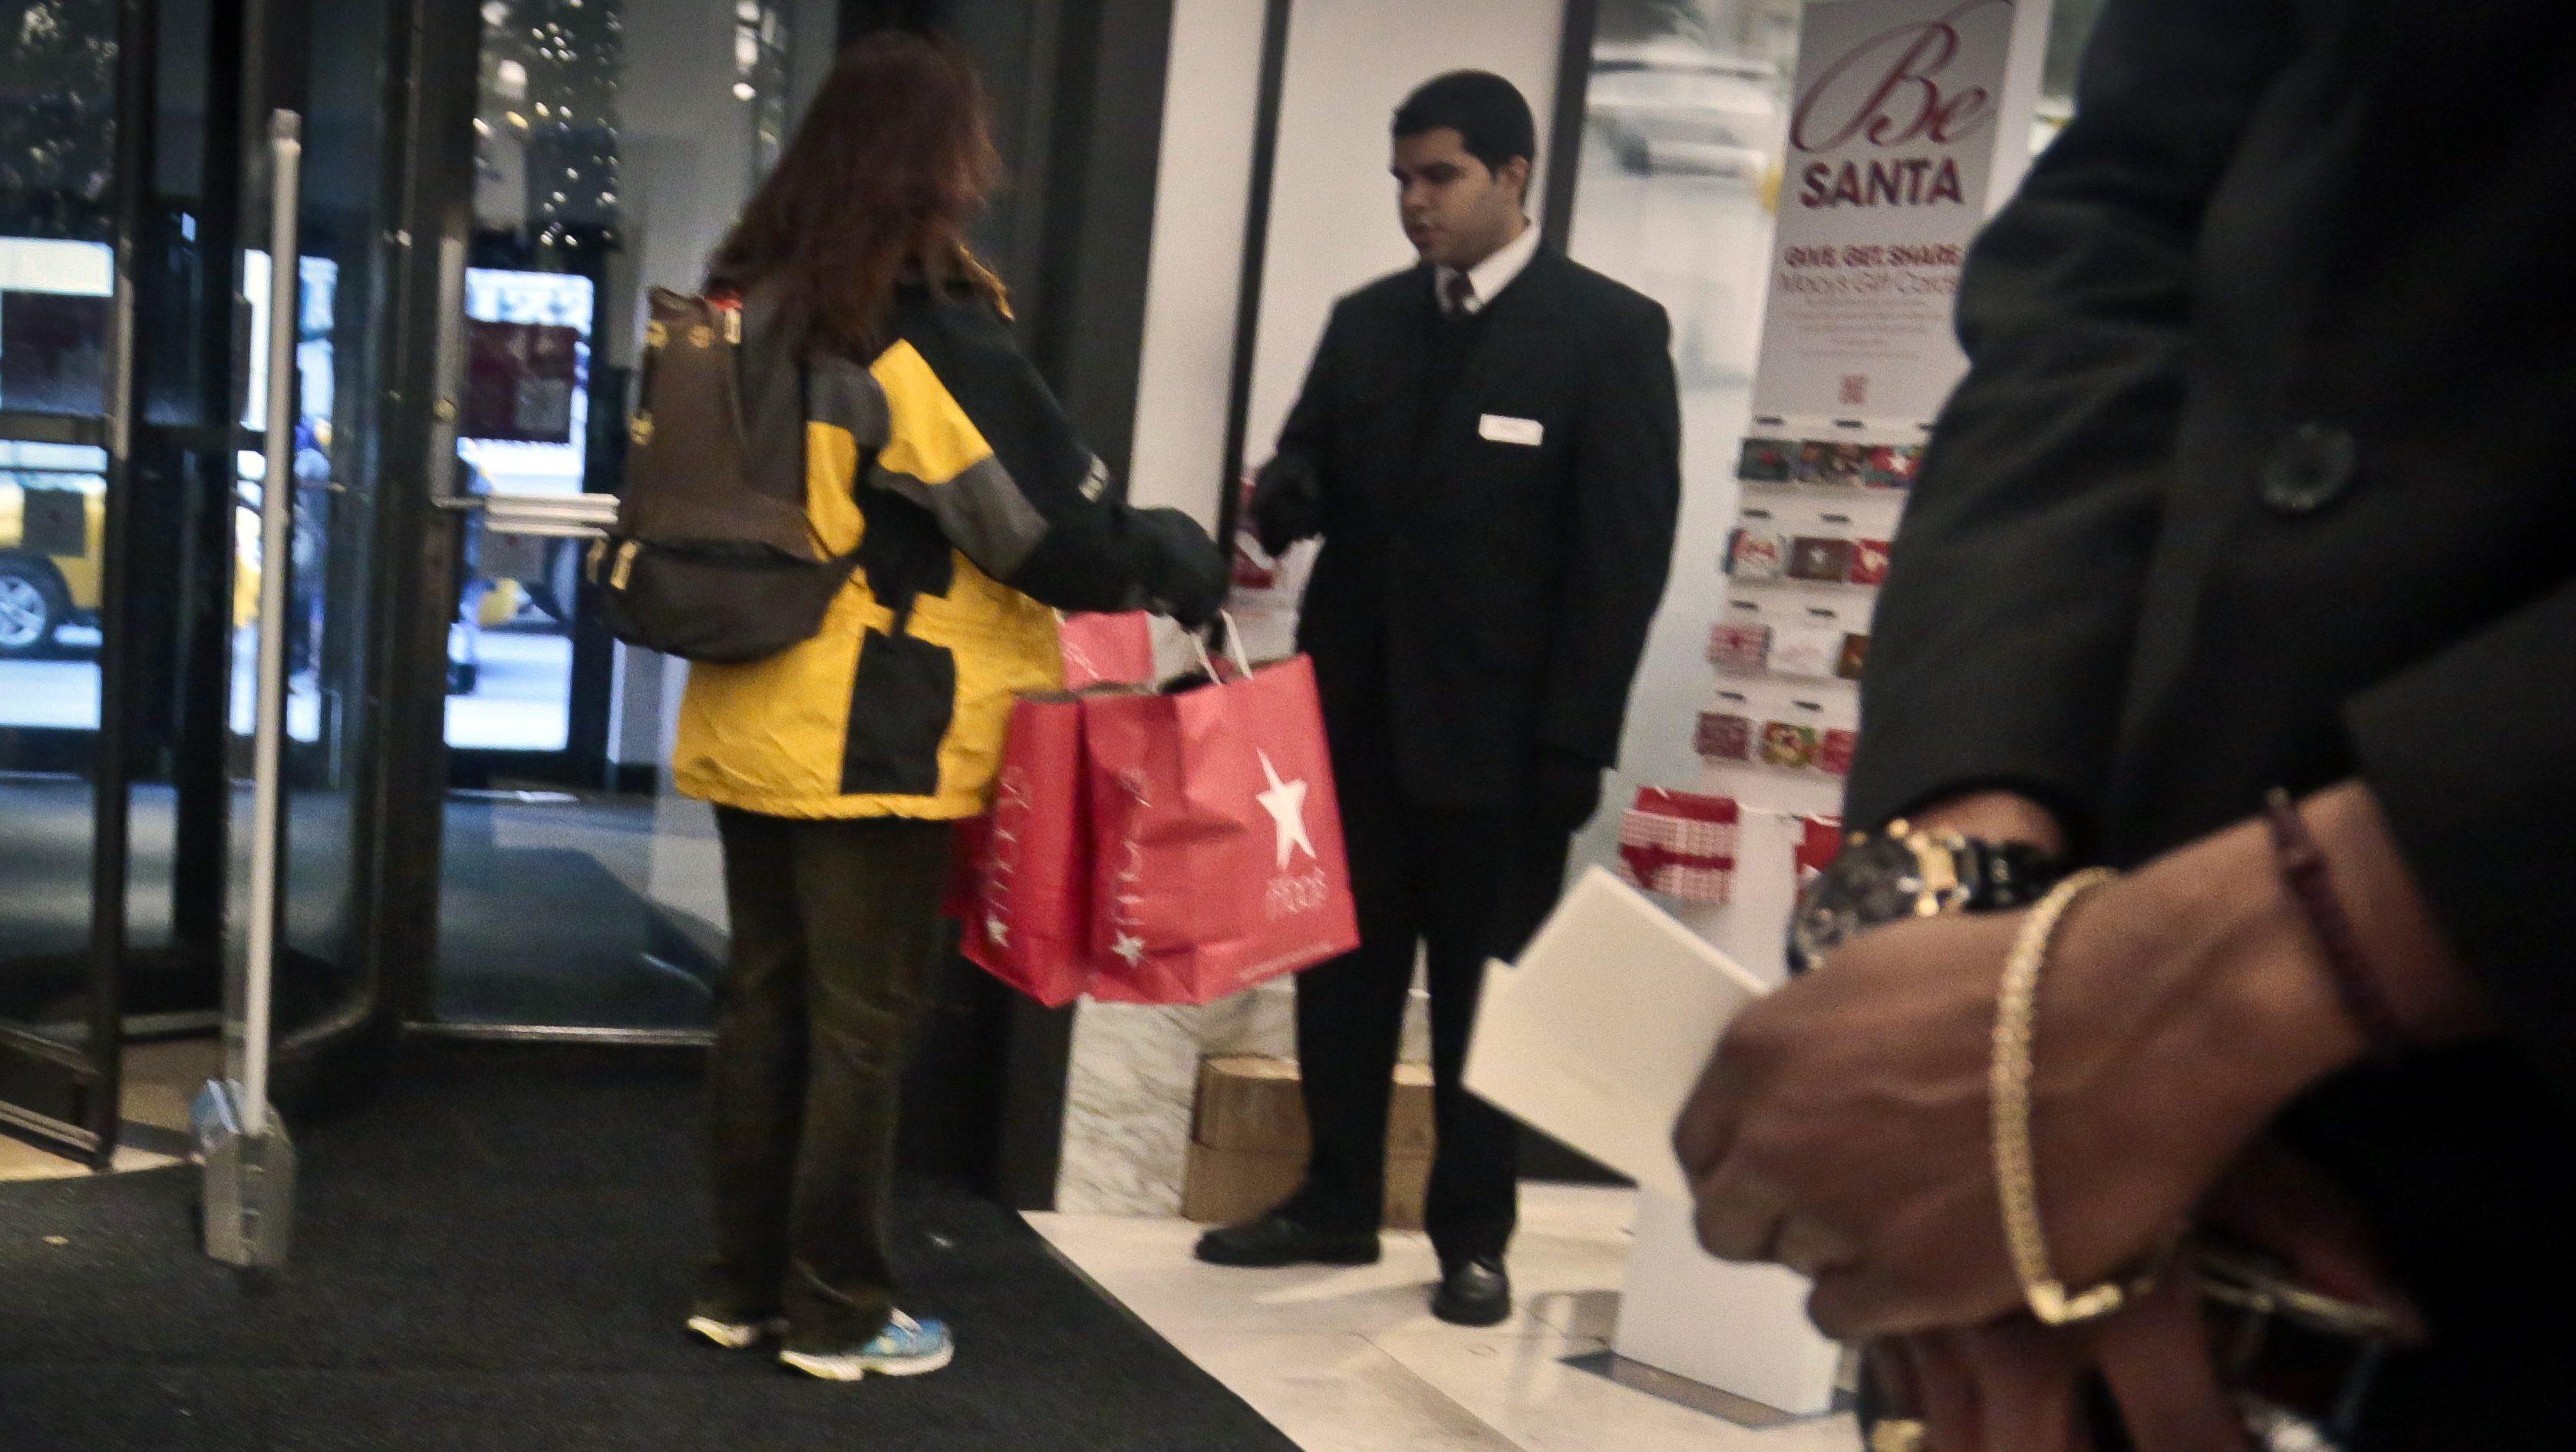 Restorative justice: Big retailers' solution to shoplifting has